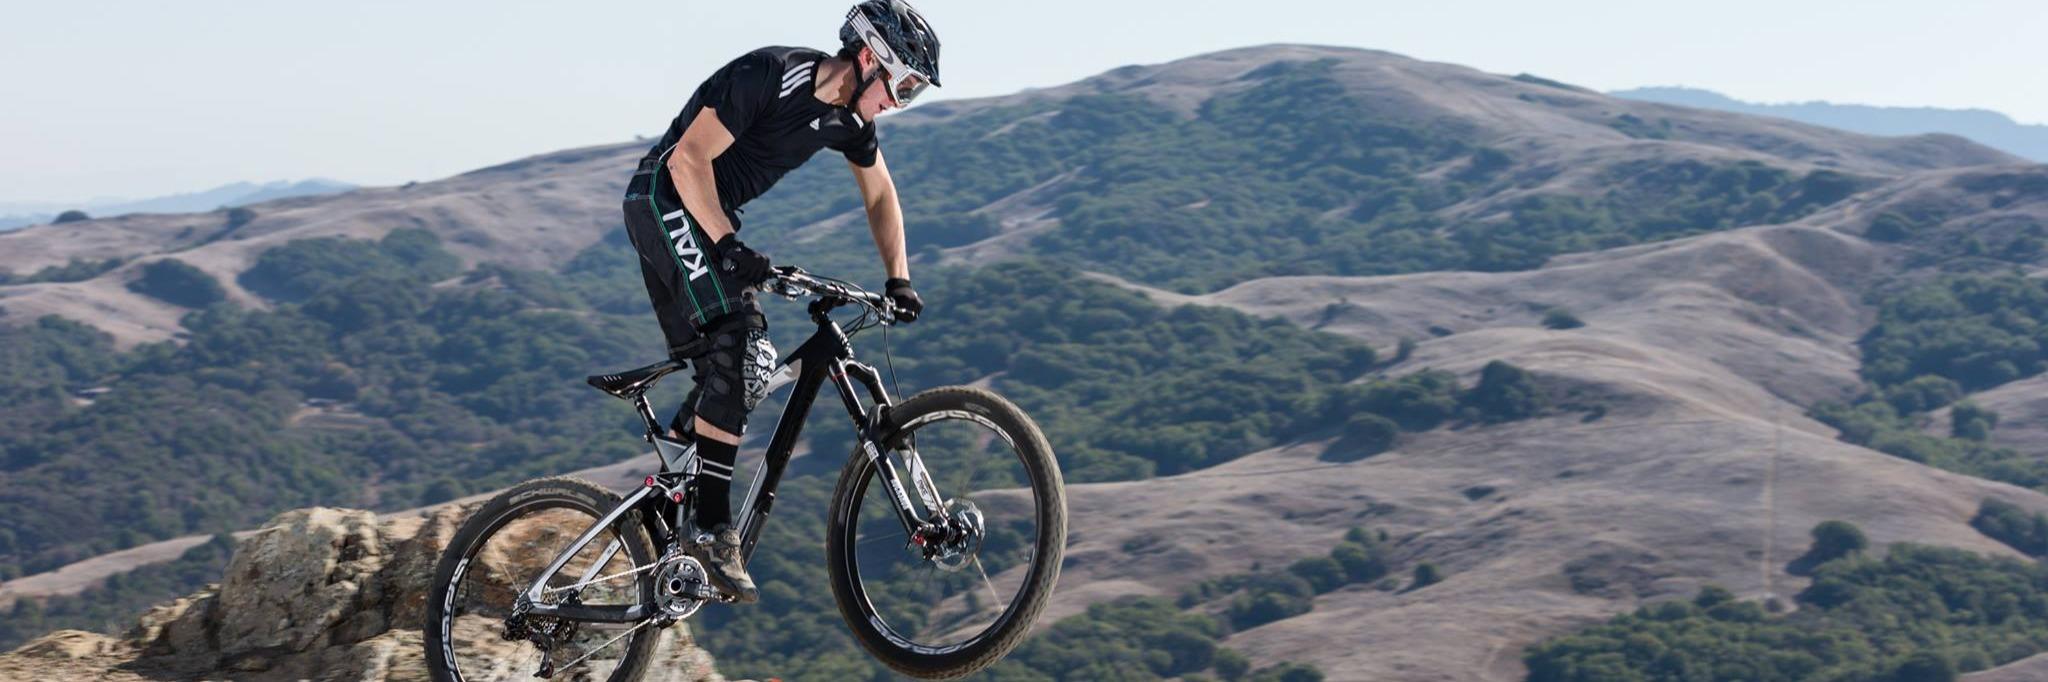 Mountain biker riding a Marin full-suspension bike.